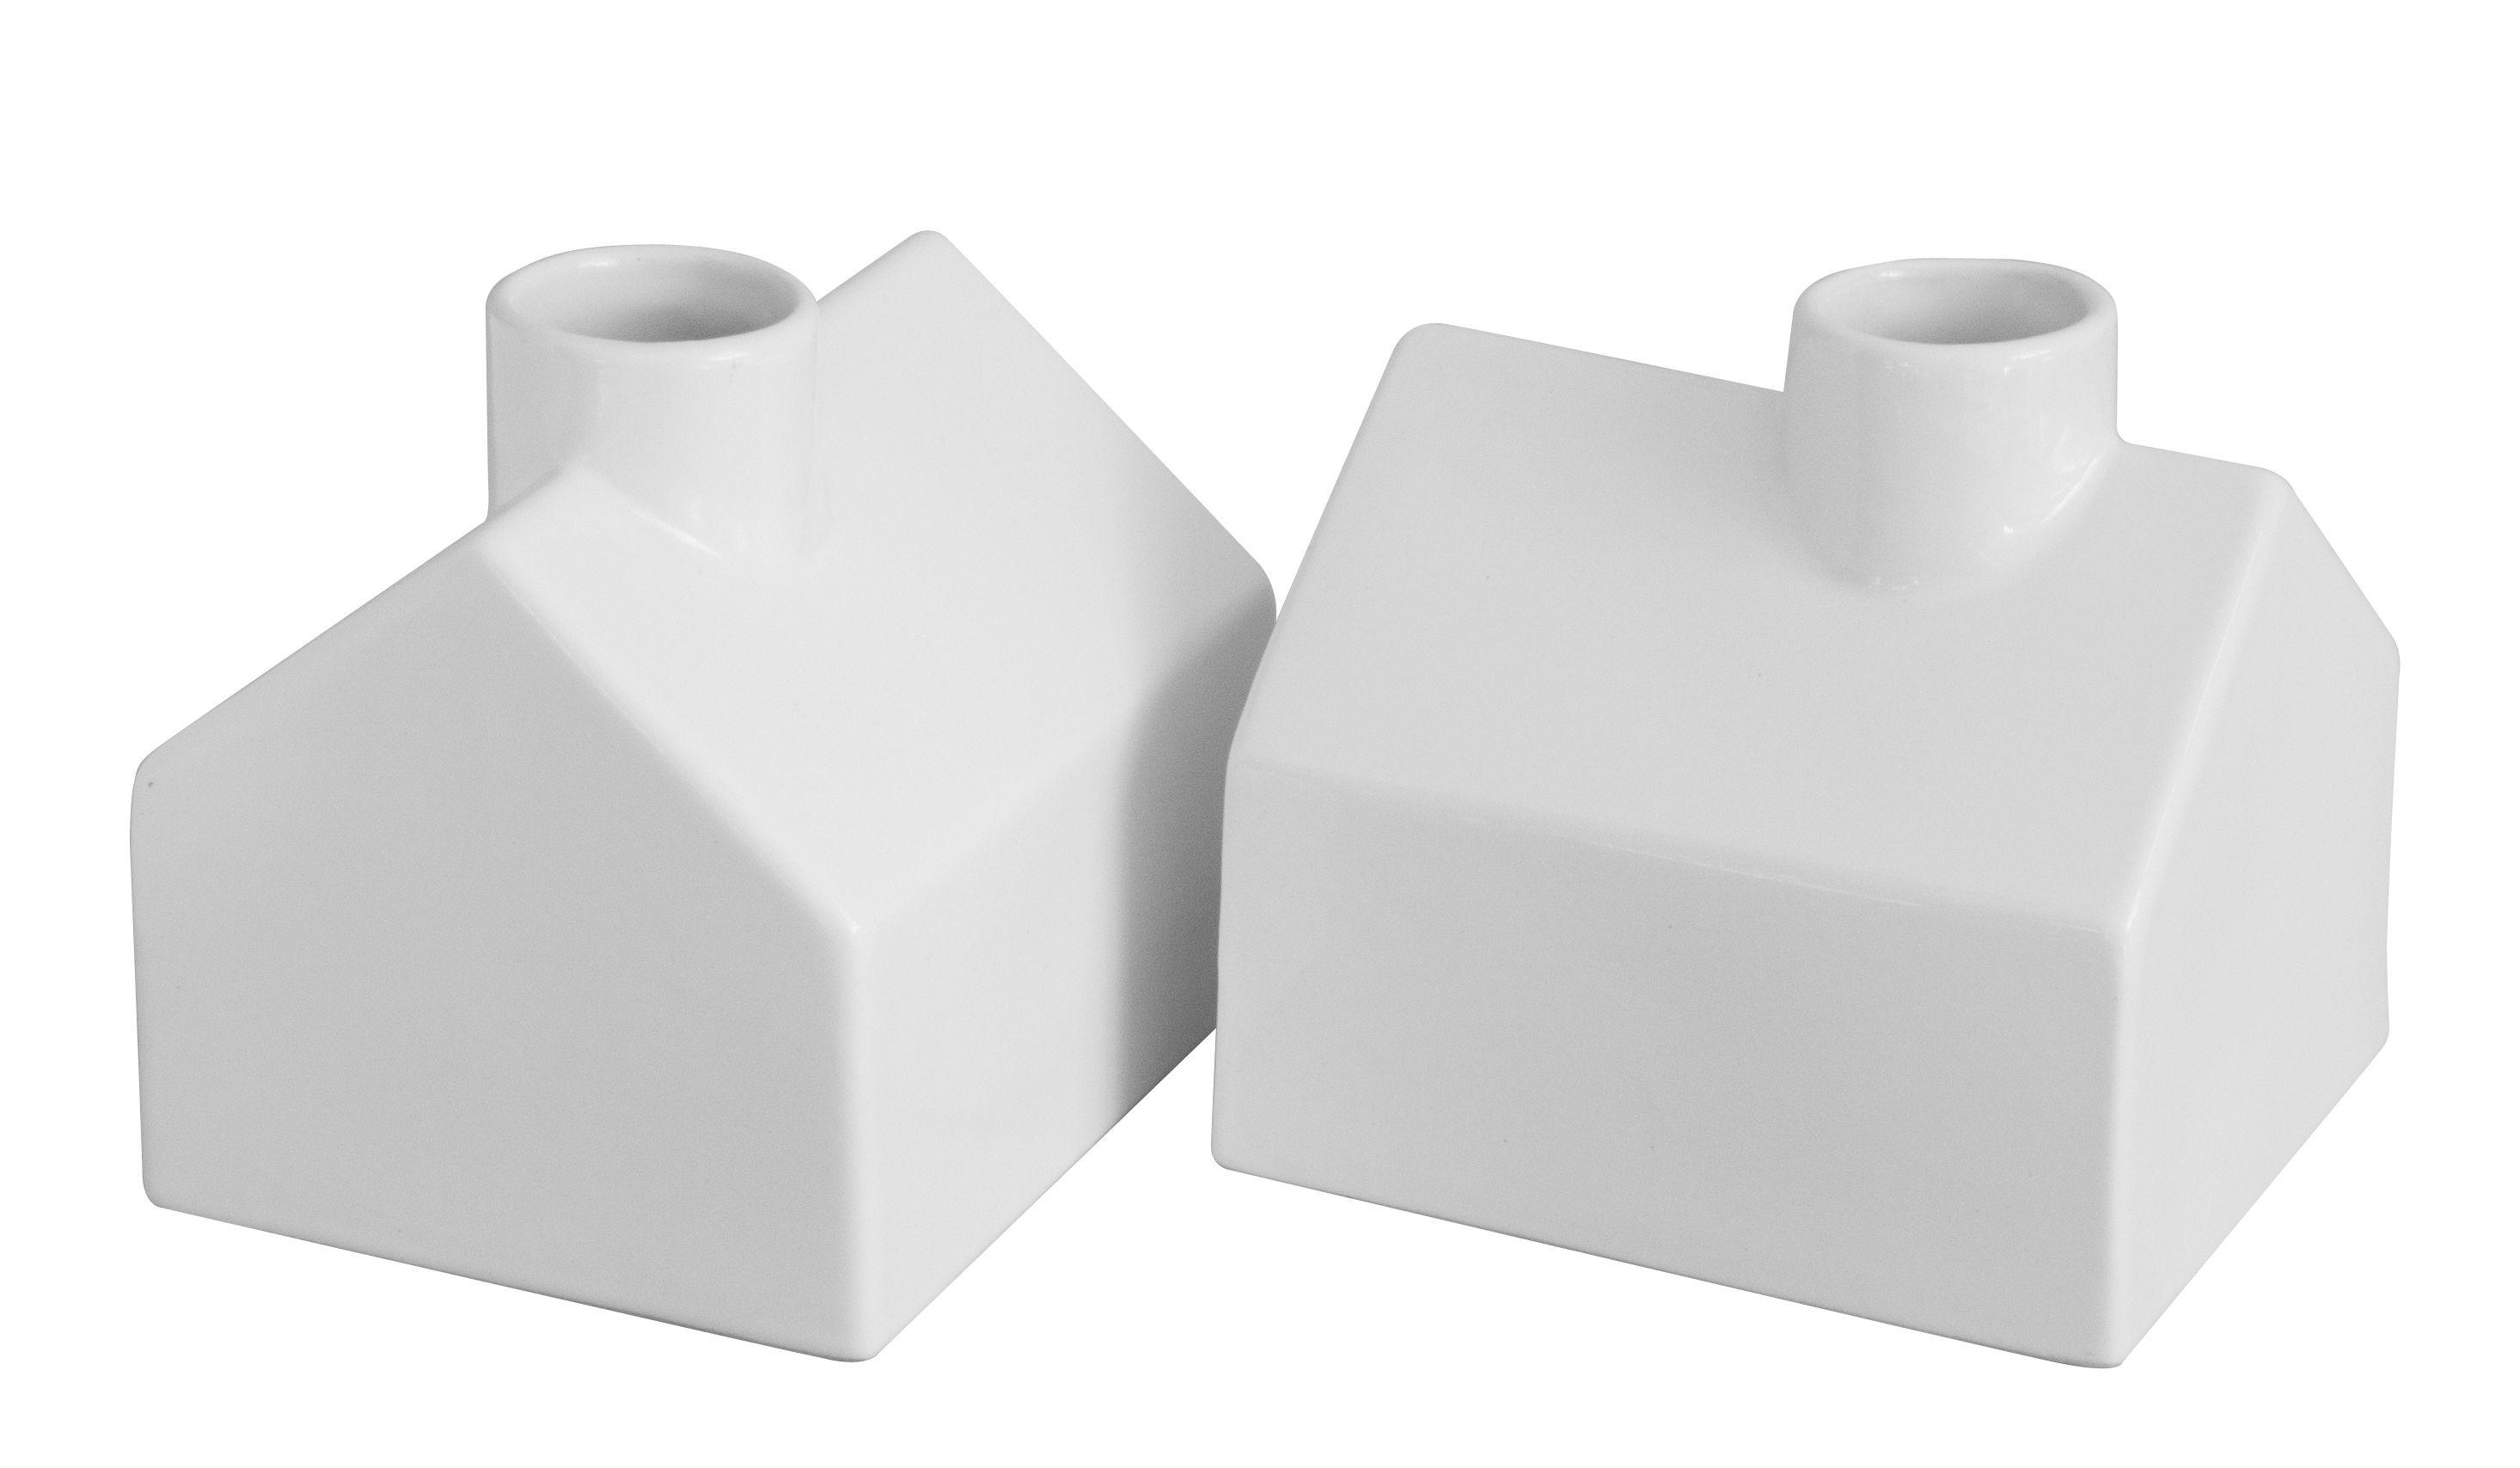 Soliflore casablanca humidificateur radiateur blanc - Humidificateur de radiateur ...